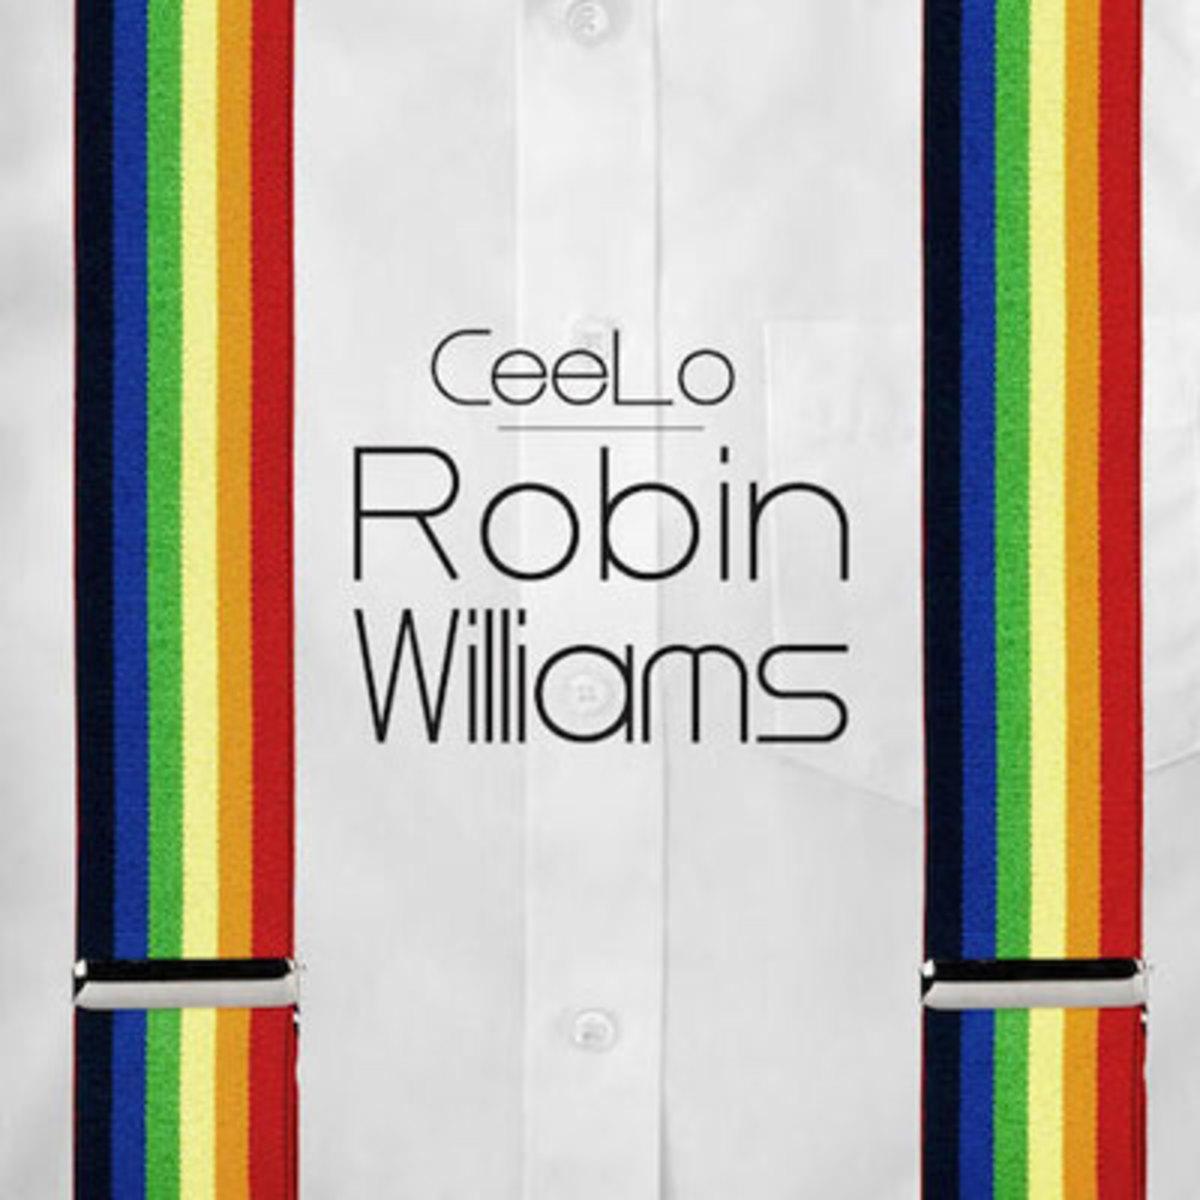 cee-lo-robin-williams.jpg